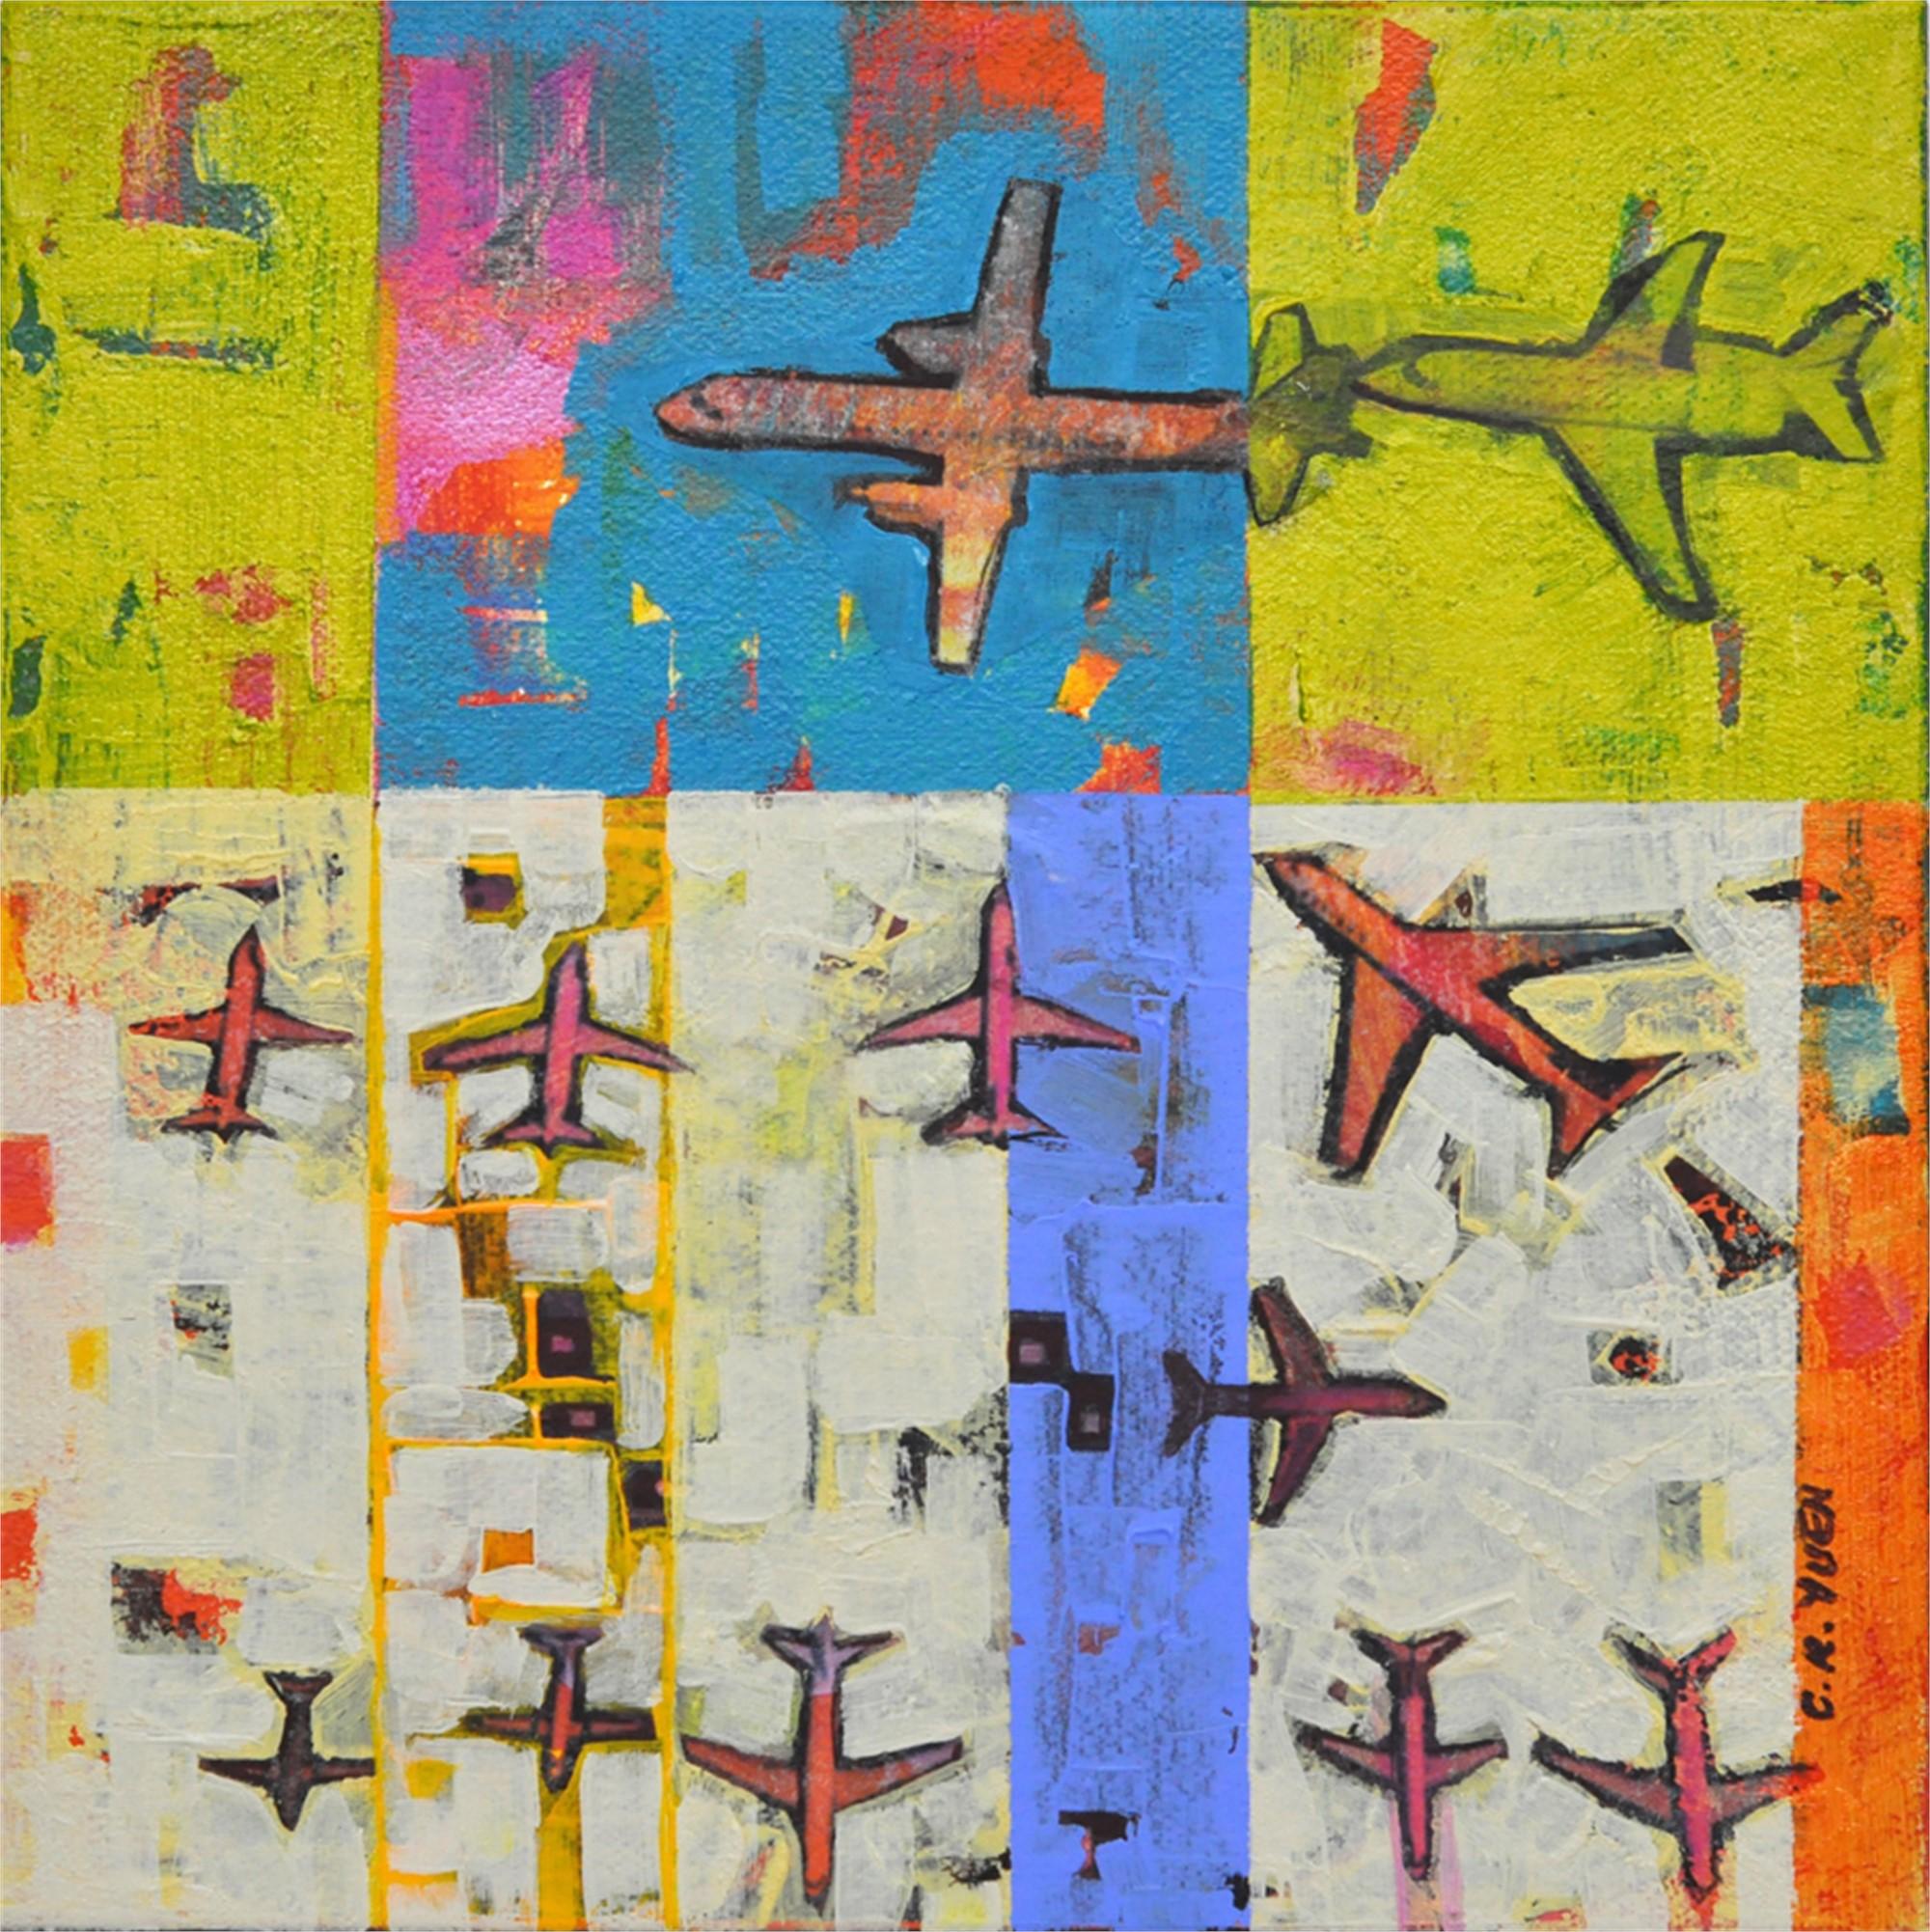 Par Avion by Chin Yuen